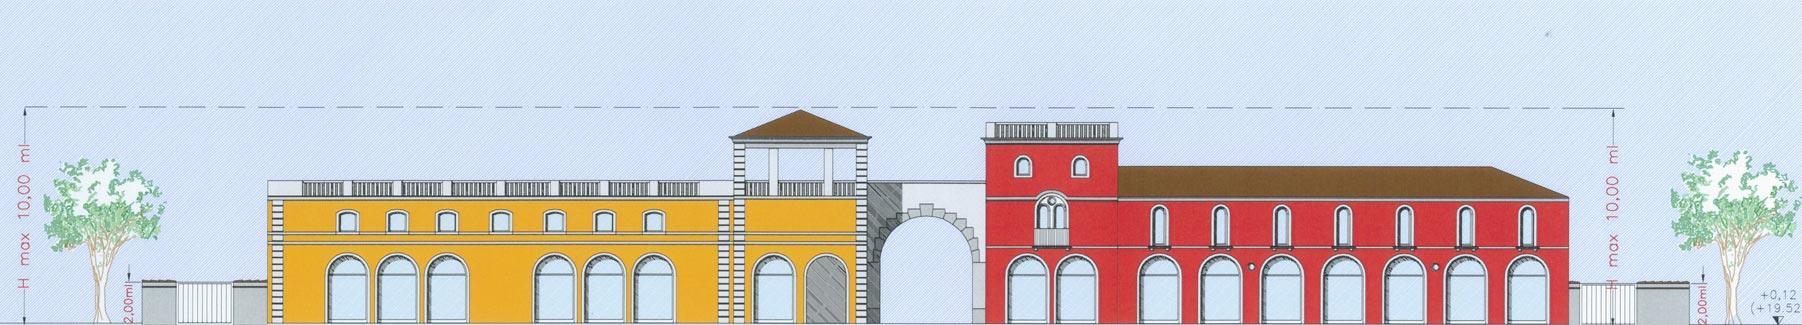 Palmanova Outlet Village - Archea Progetti